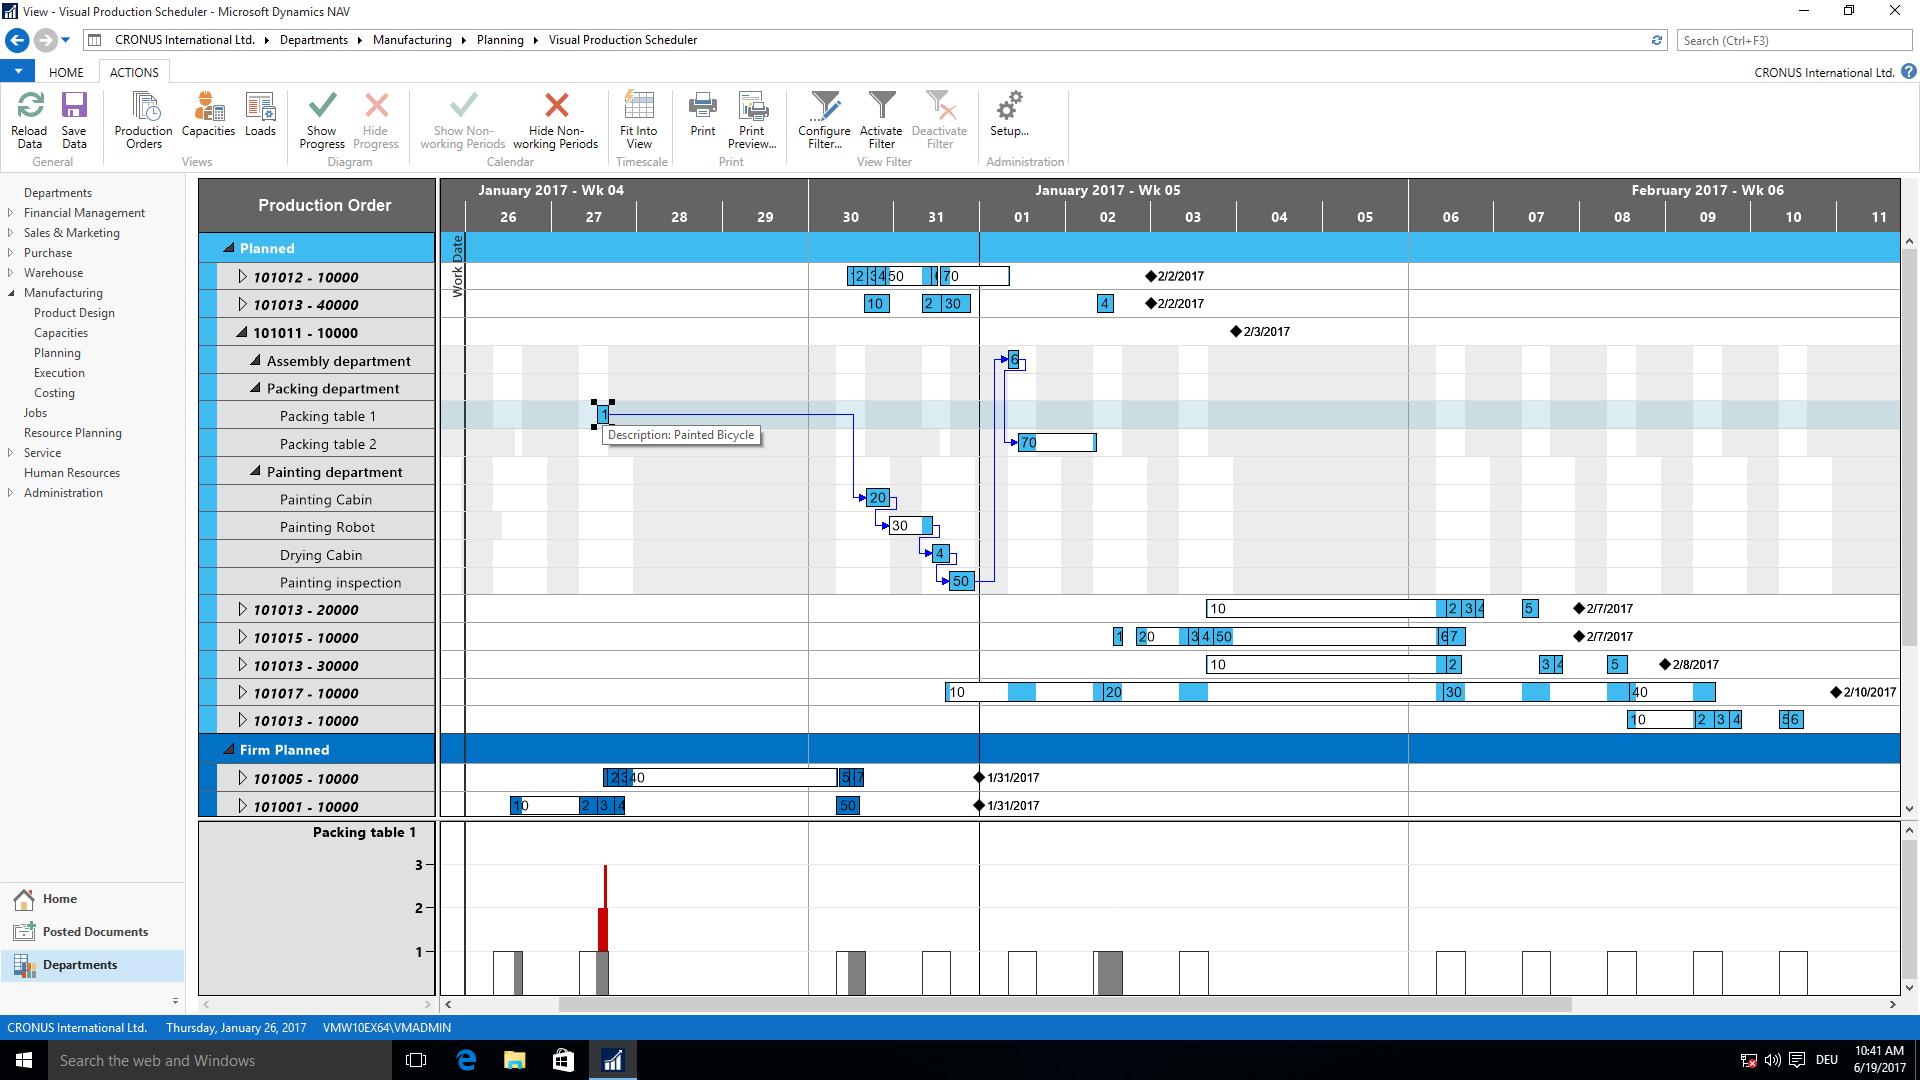 Delightful Production Scheduler Job Description Project Engineering Essay For NAV    Visual Production